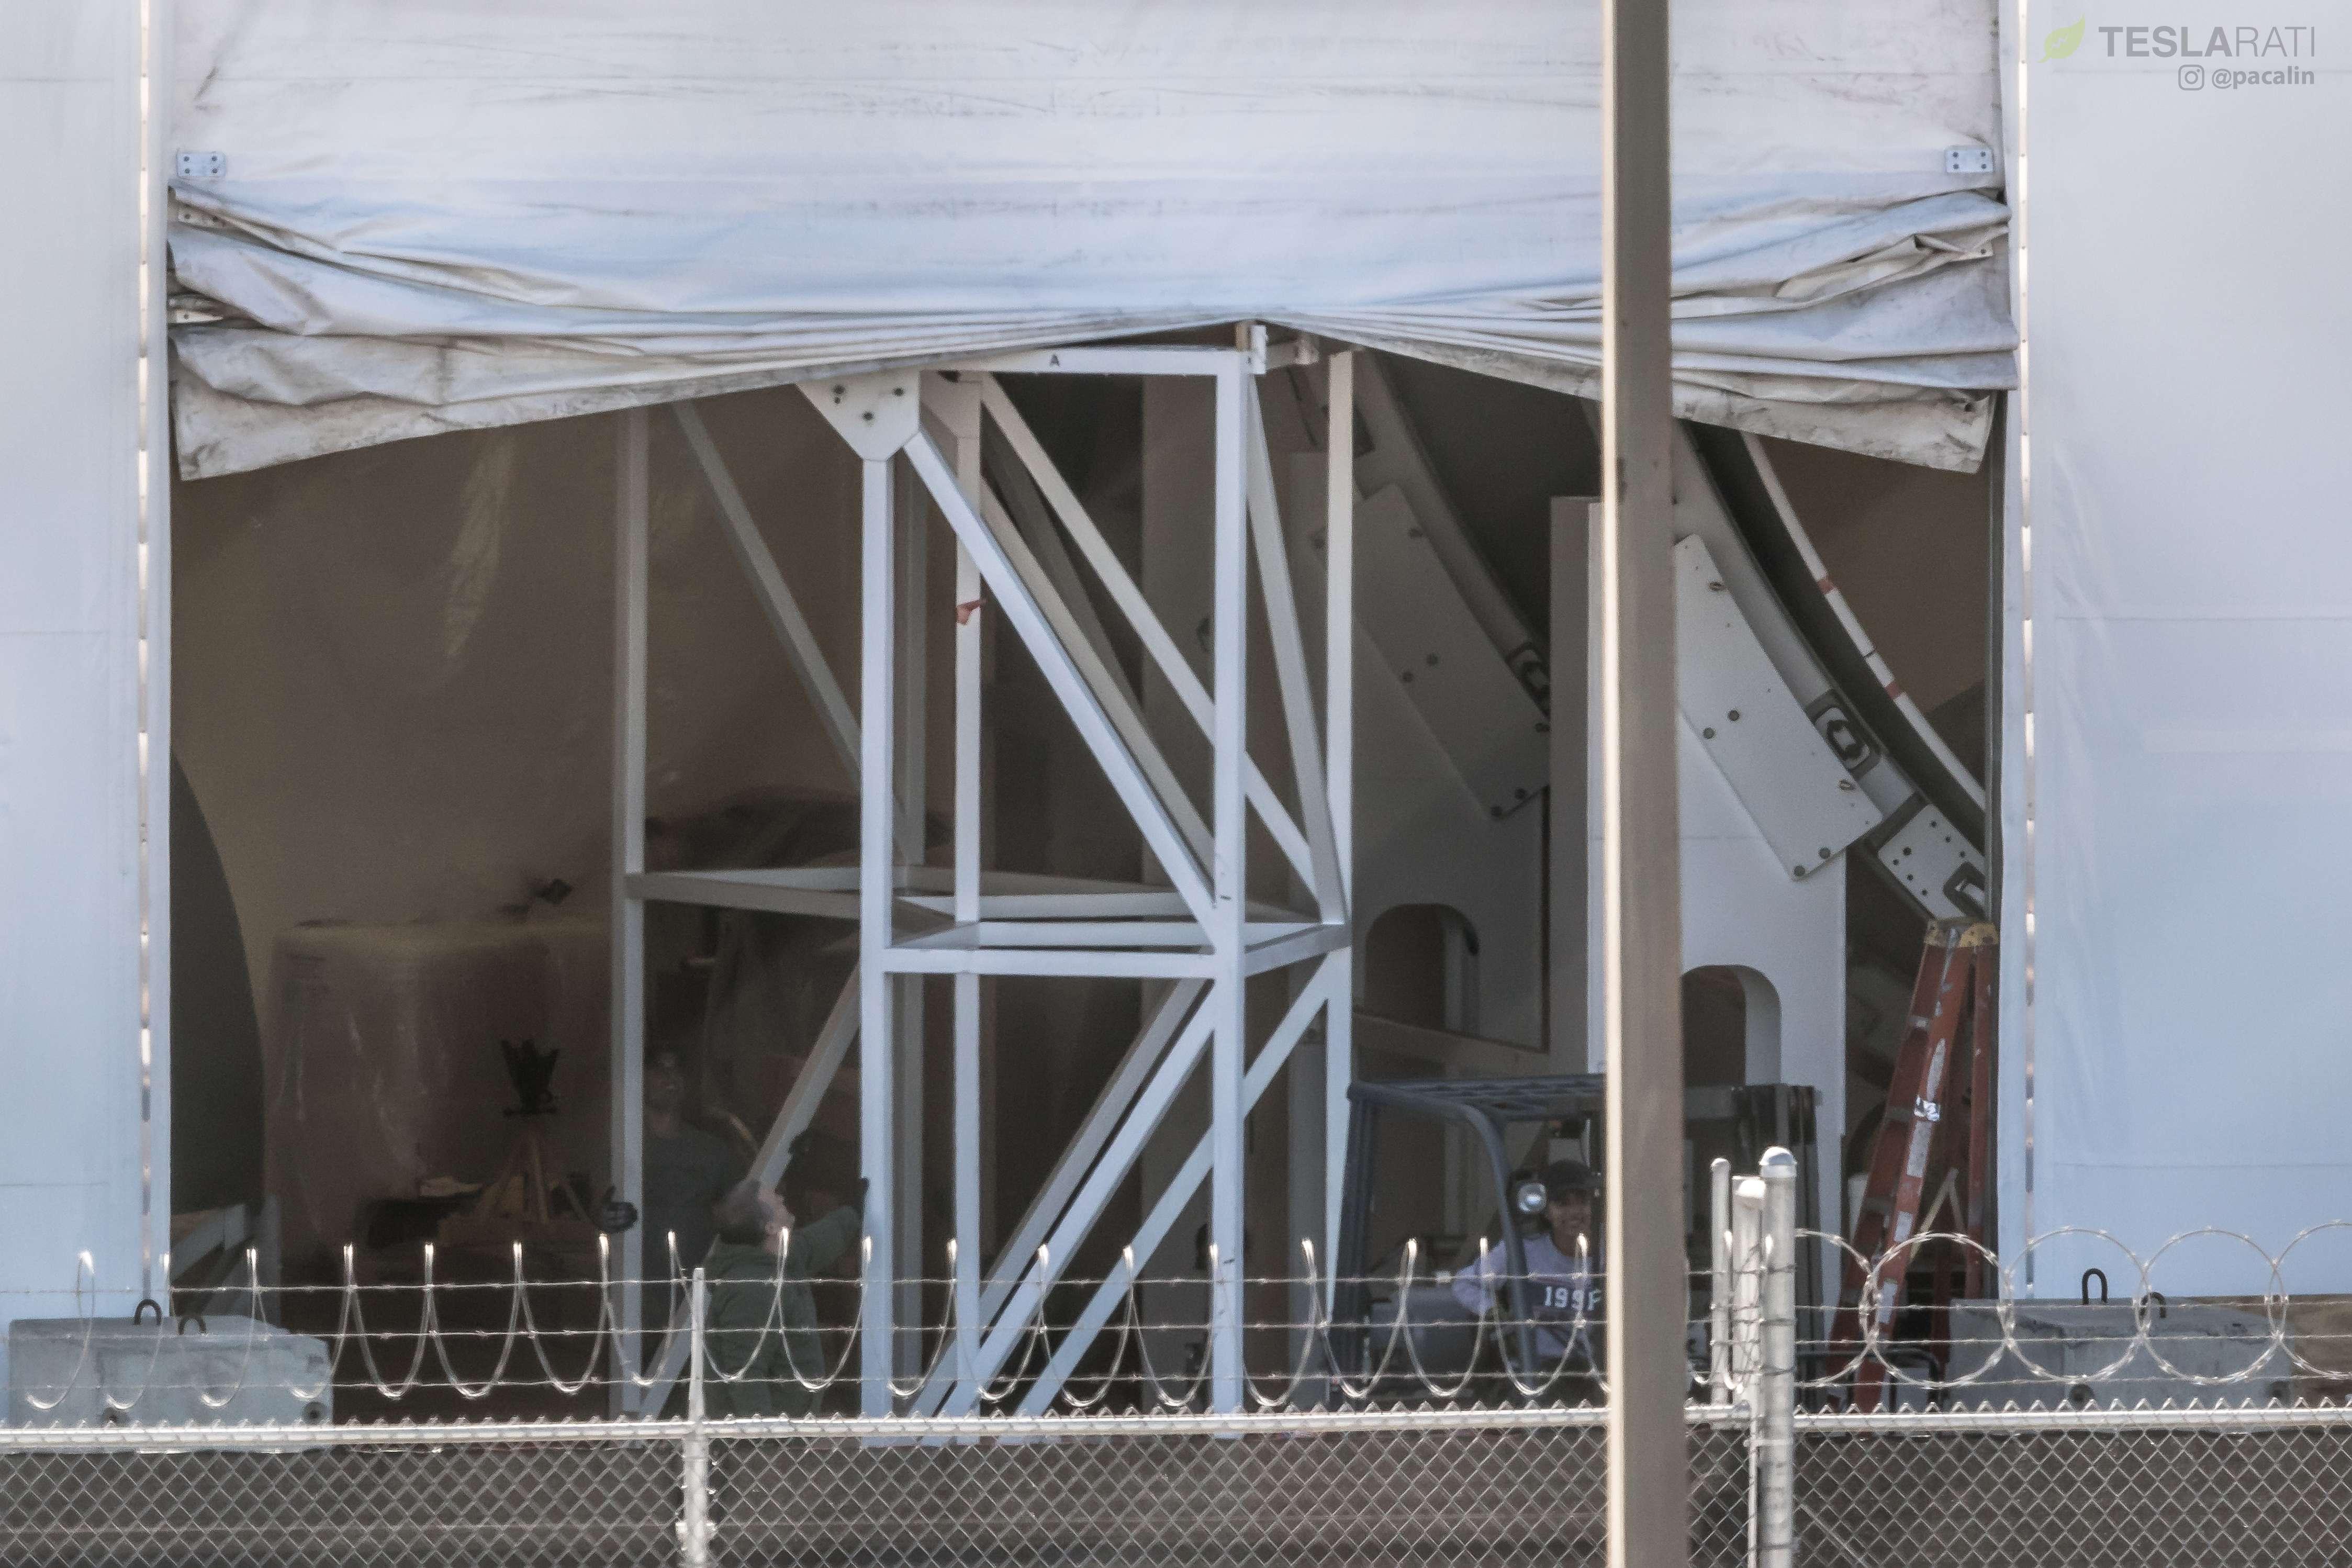 BFR tent spaceship tank dome 111218 (Pauline Acalin) 5